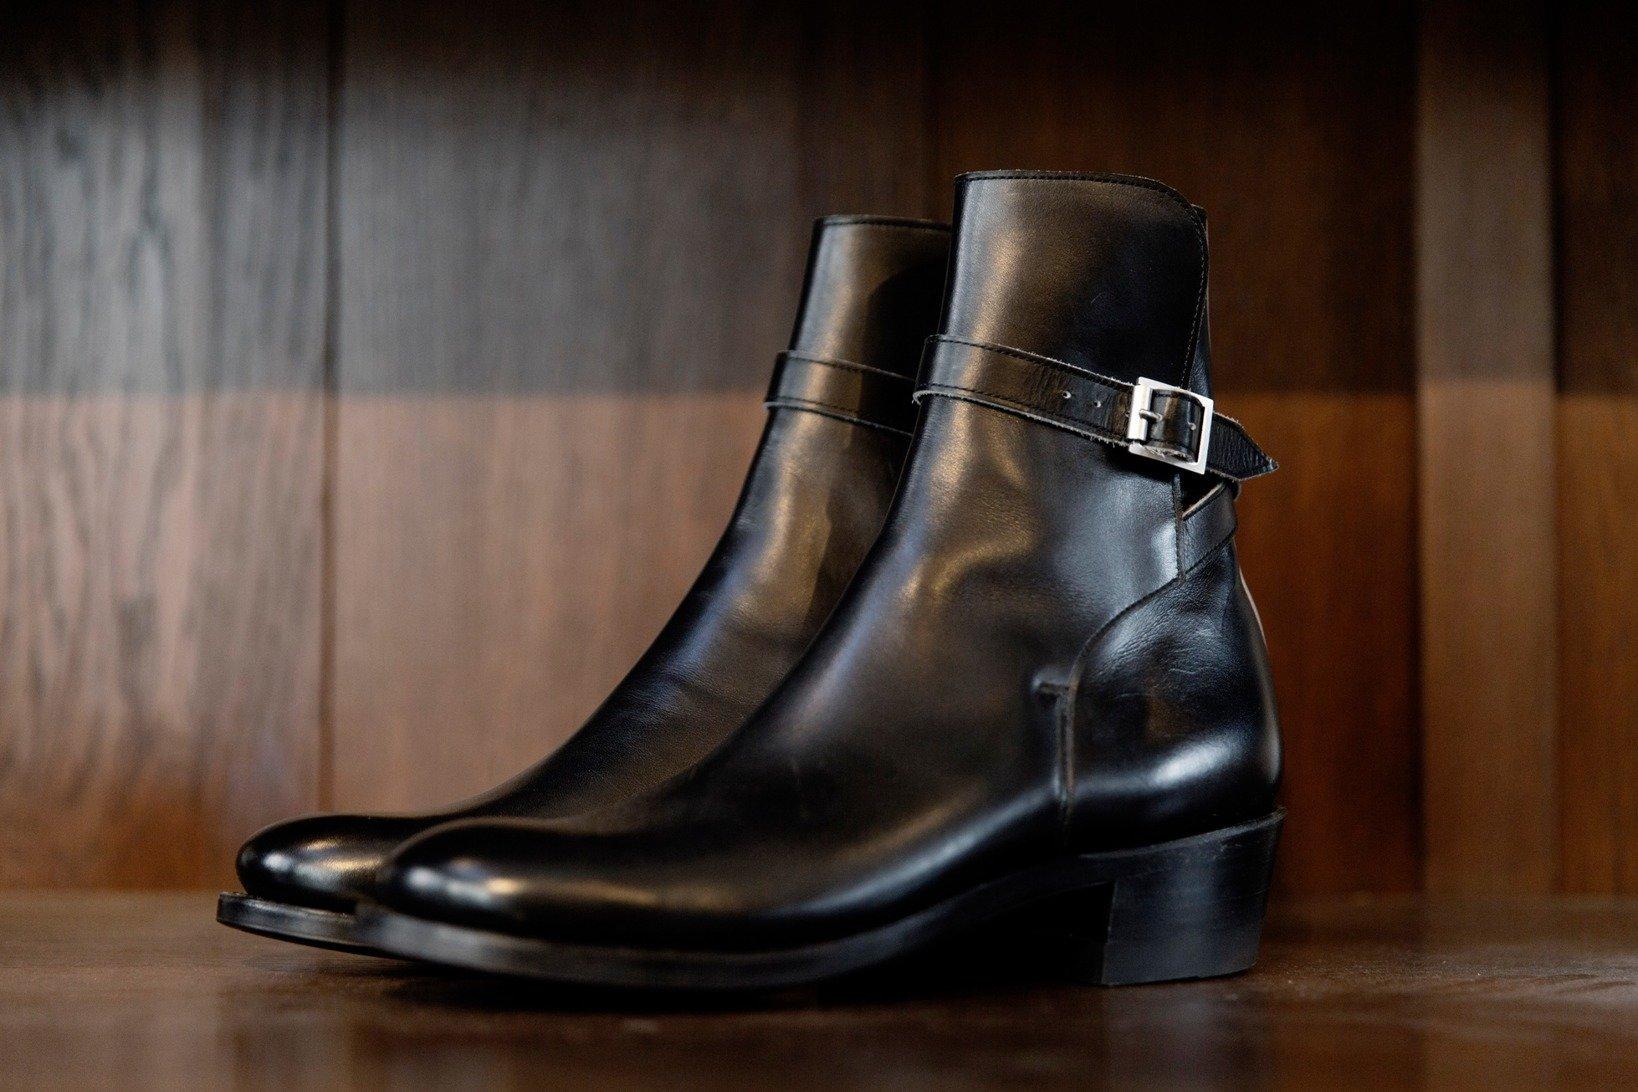 CLINCHの<a href=https://www.brass-tokyo.co.jp/onlineshop/item/clinch-jodhpur-boots/ target='_blank'>ジョッパーブーツ</a>はスラっとした佇まいがとにかく凛々しい!